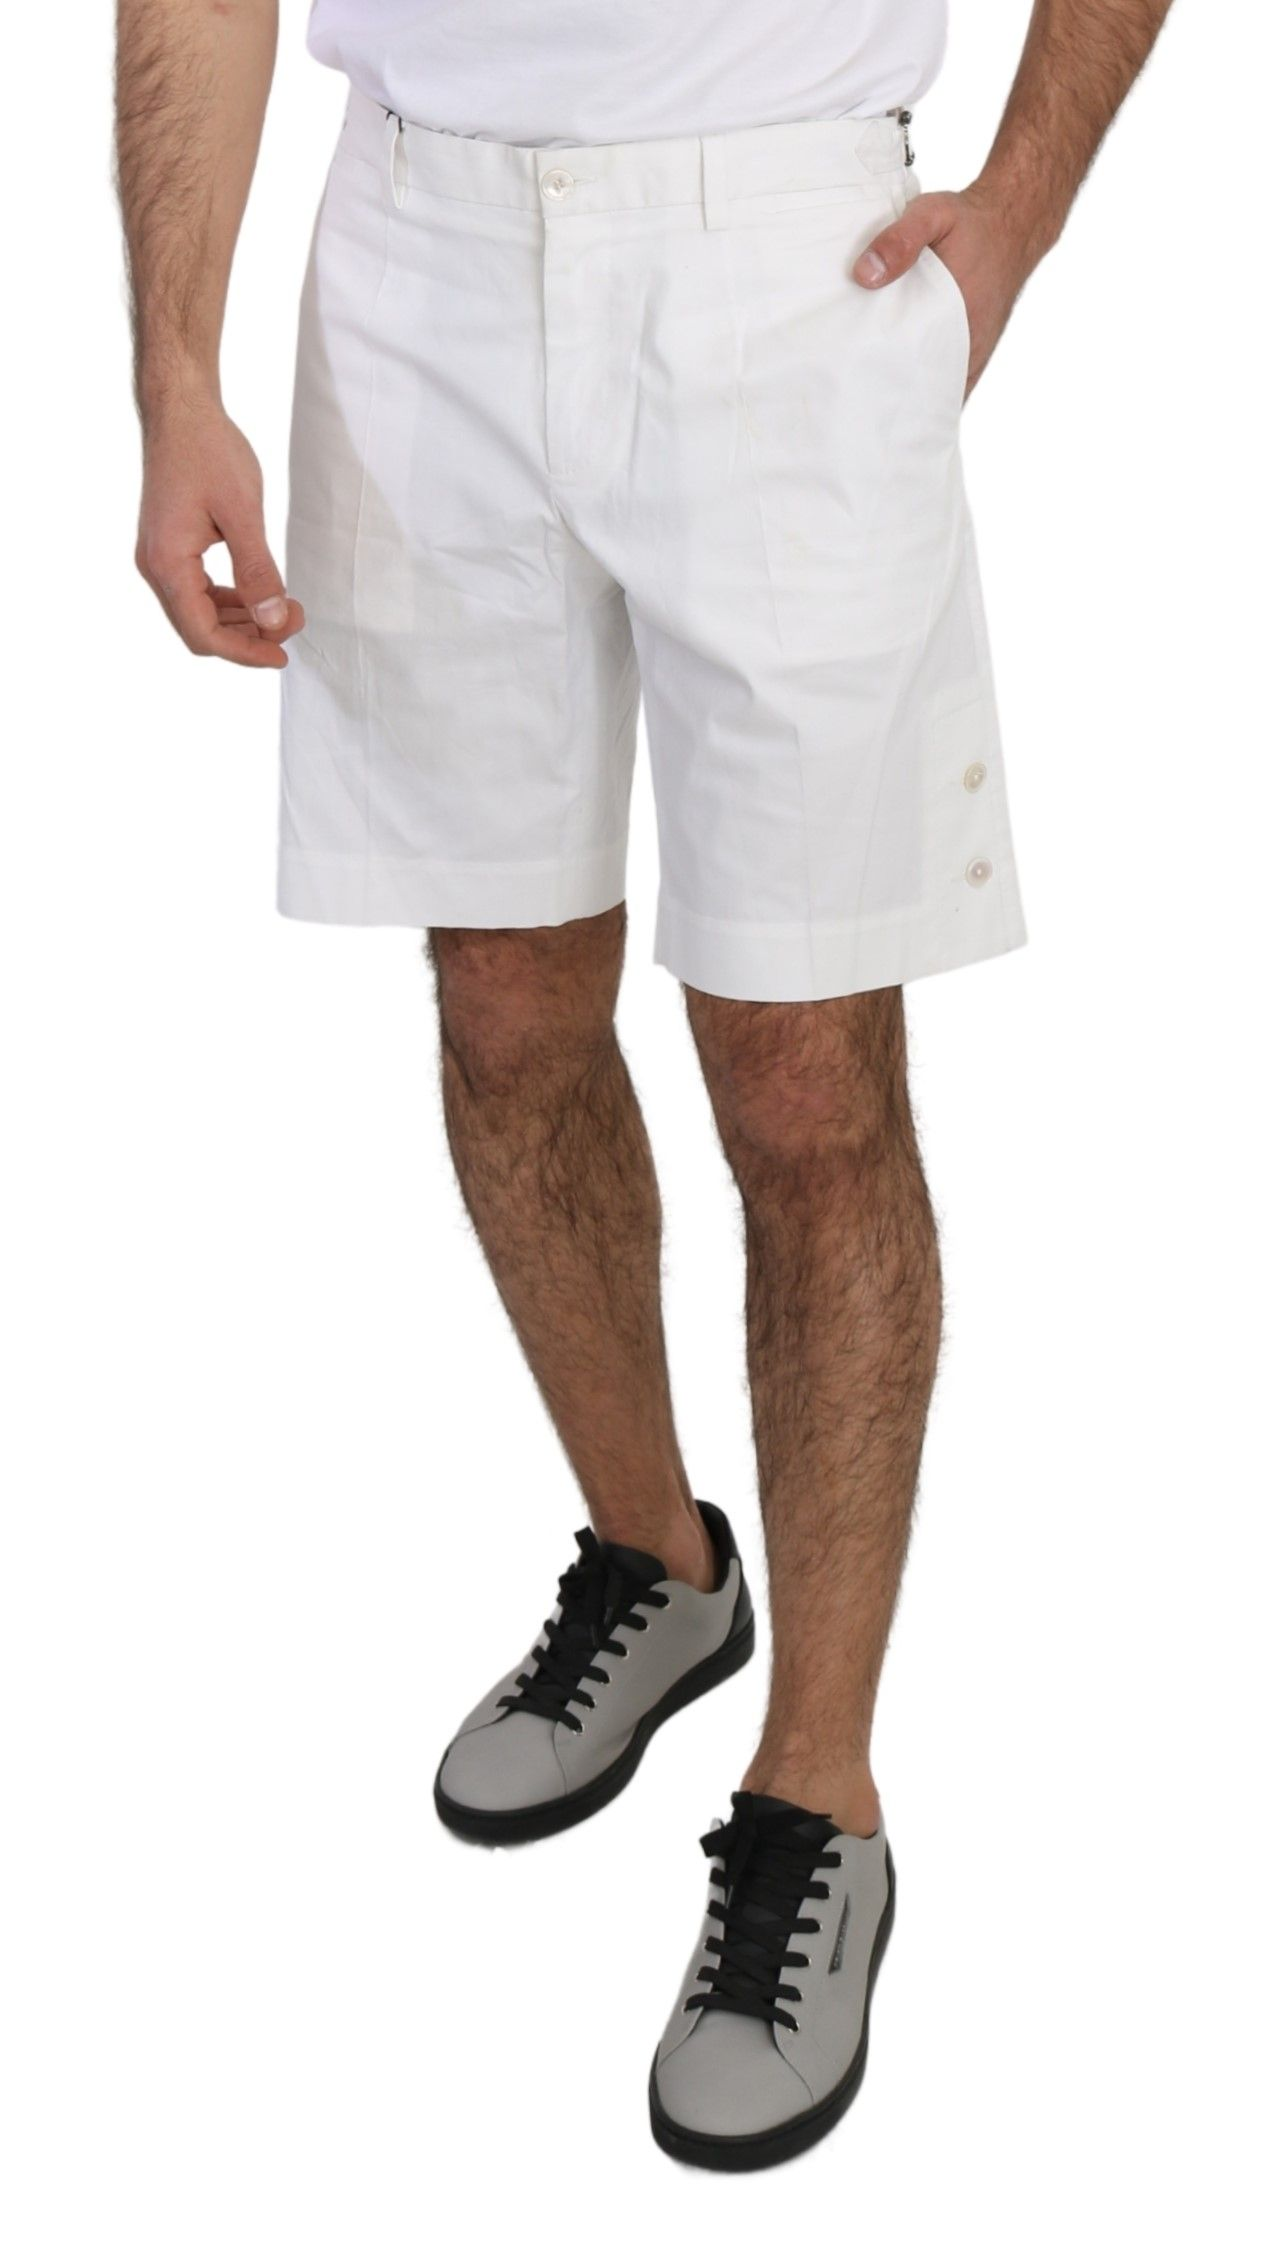 Dolce & Gabbana White Cotton Stretch Casual Knee High Shorts